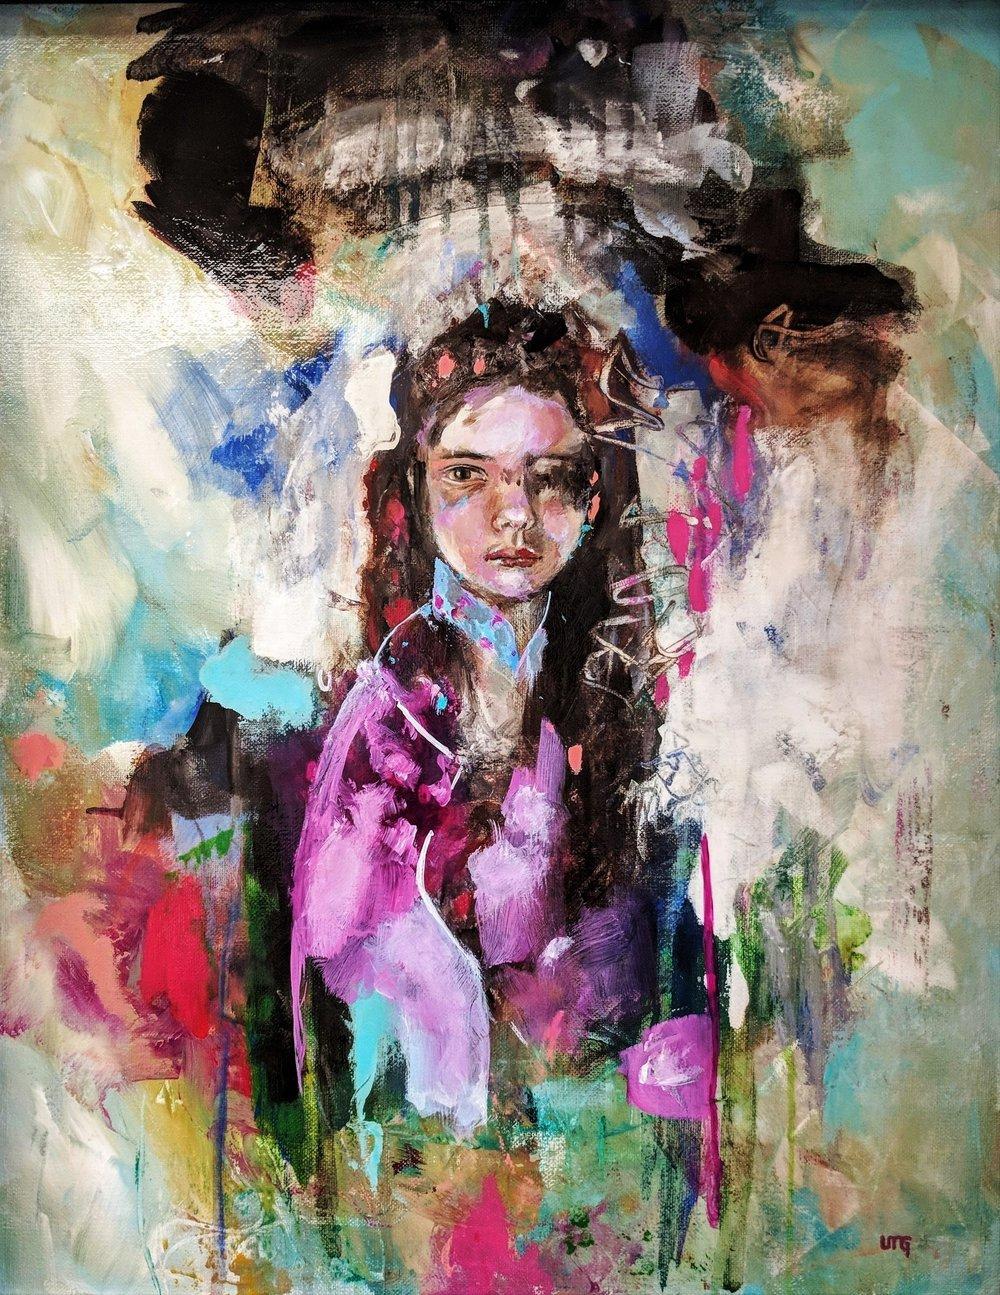 Little Nymph Geisha#Acrylic on canvas#20 x 16 inches#$1,200